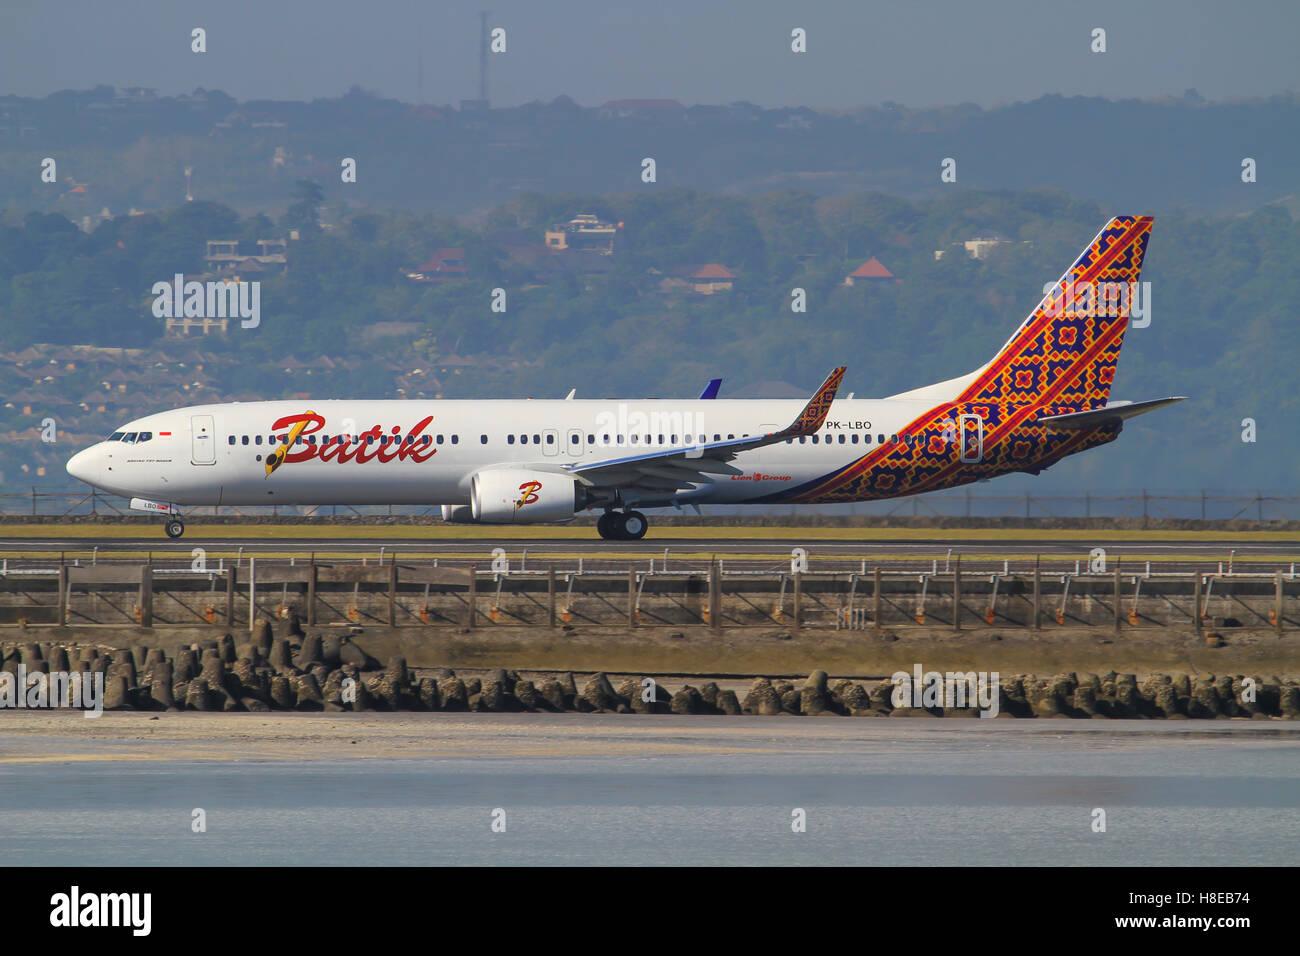 Batik Boeing 737 - Stock Image